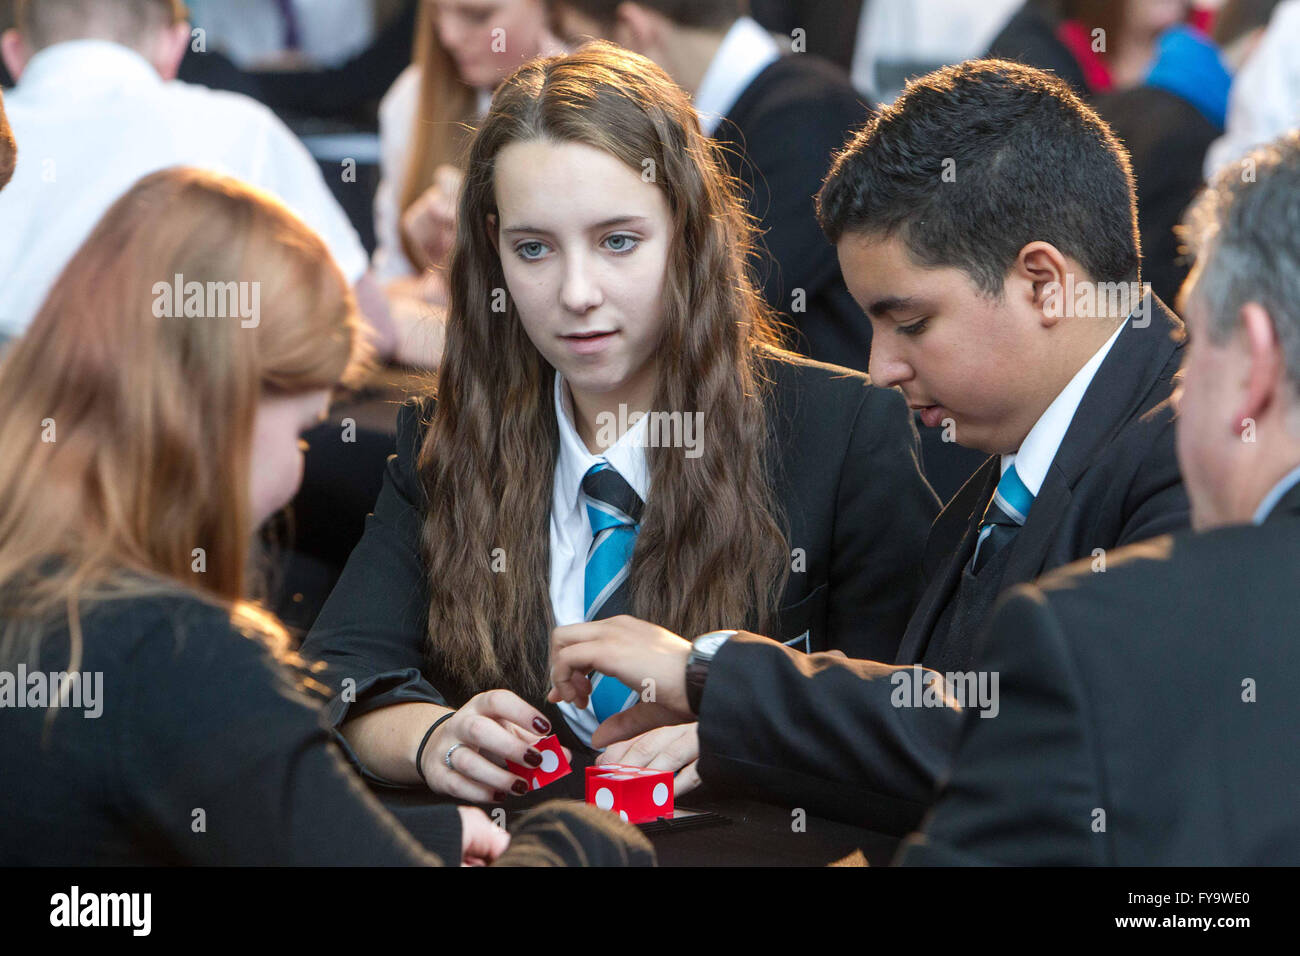 School children studying - Stock Image